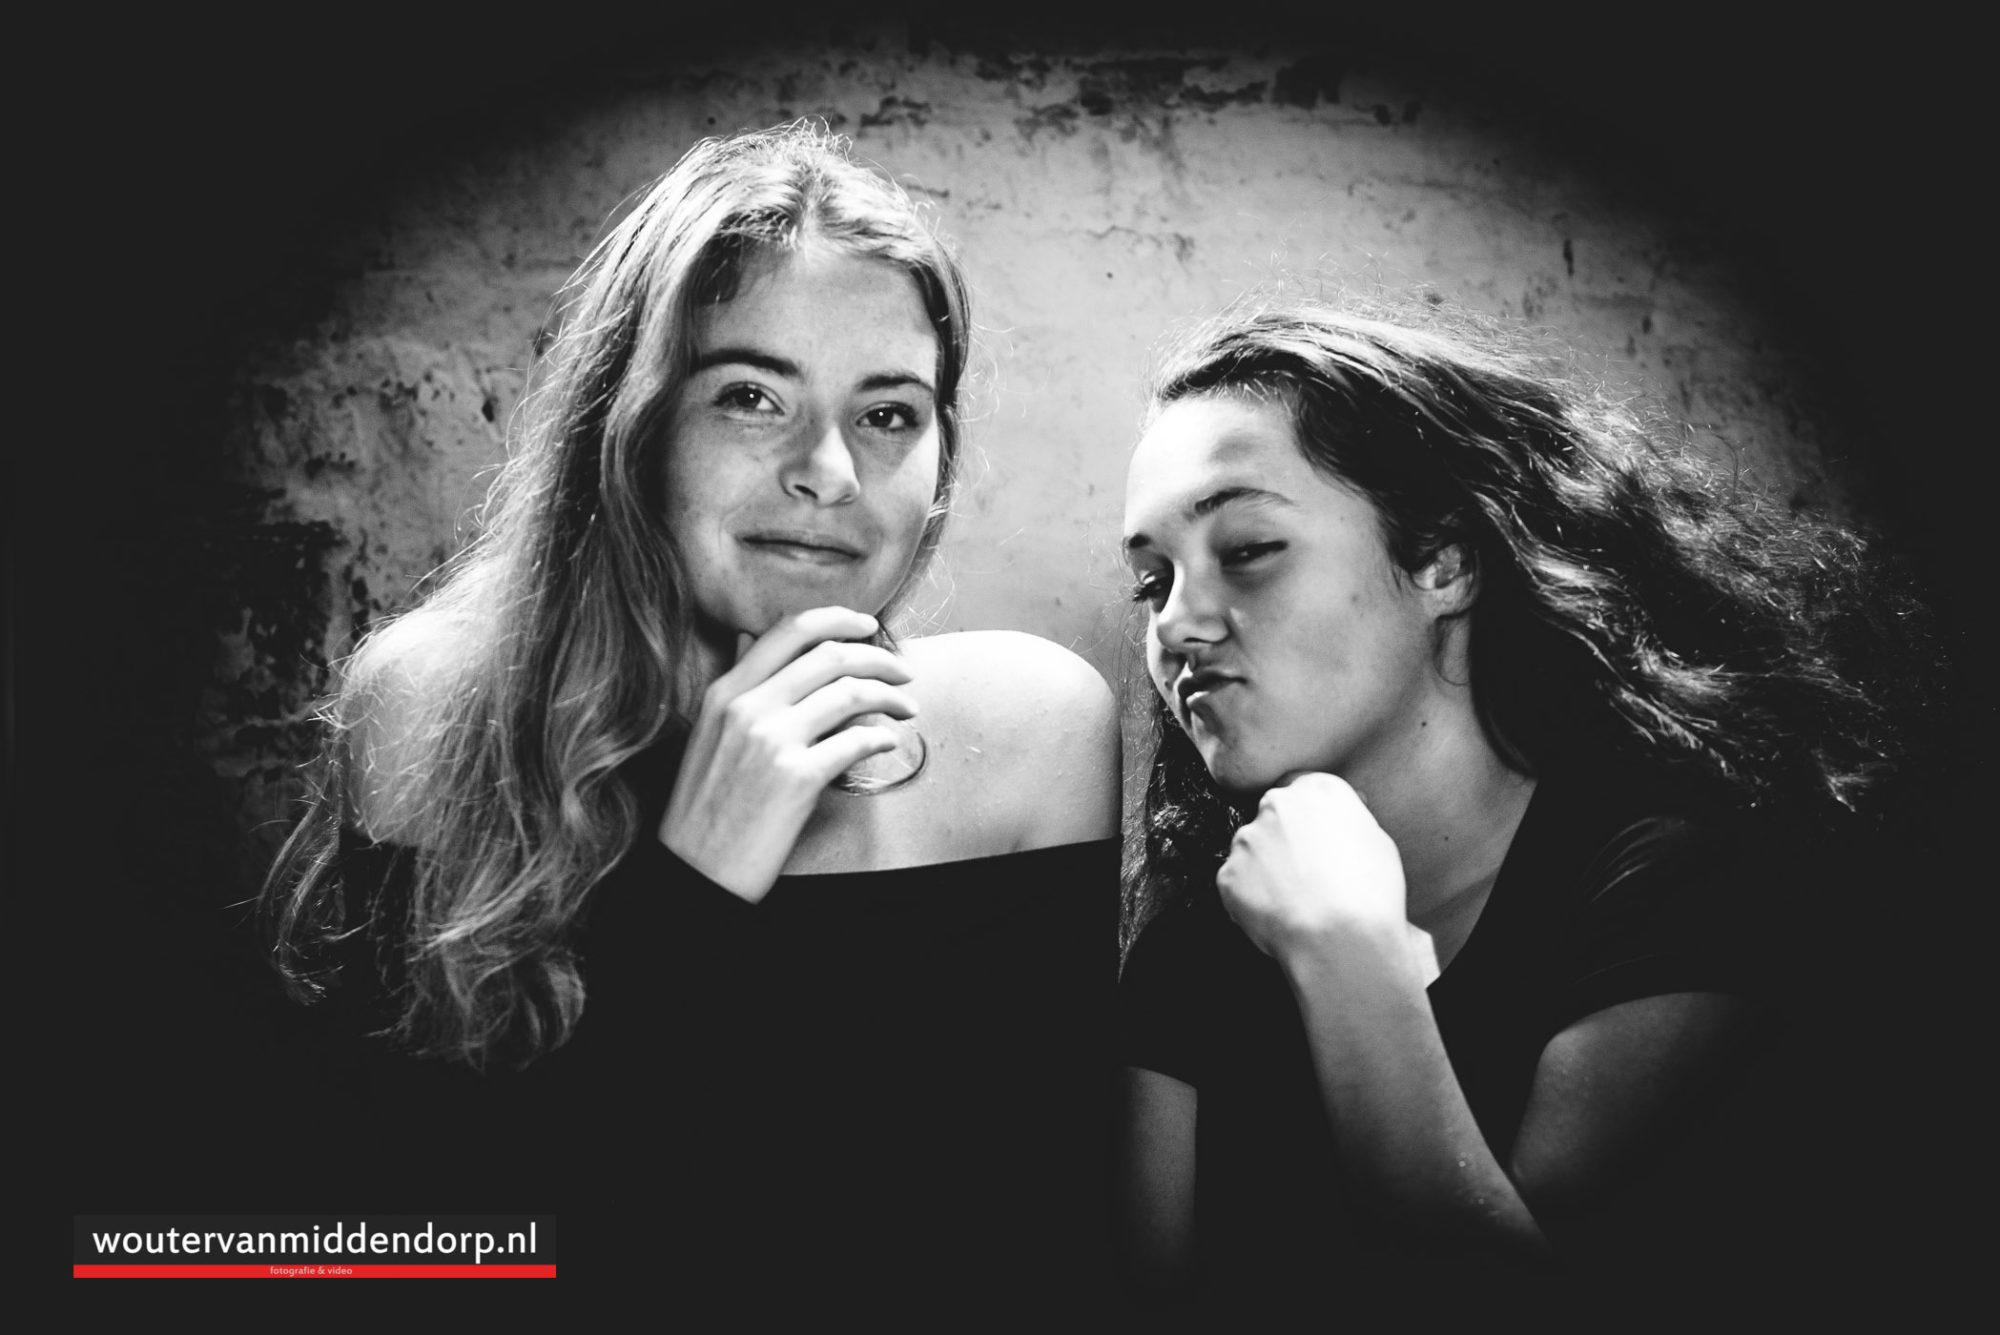 fotograaf Wouter van Middendorp Nunspeet-10